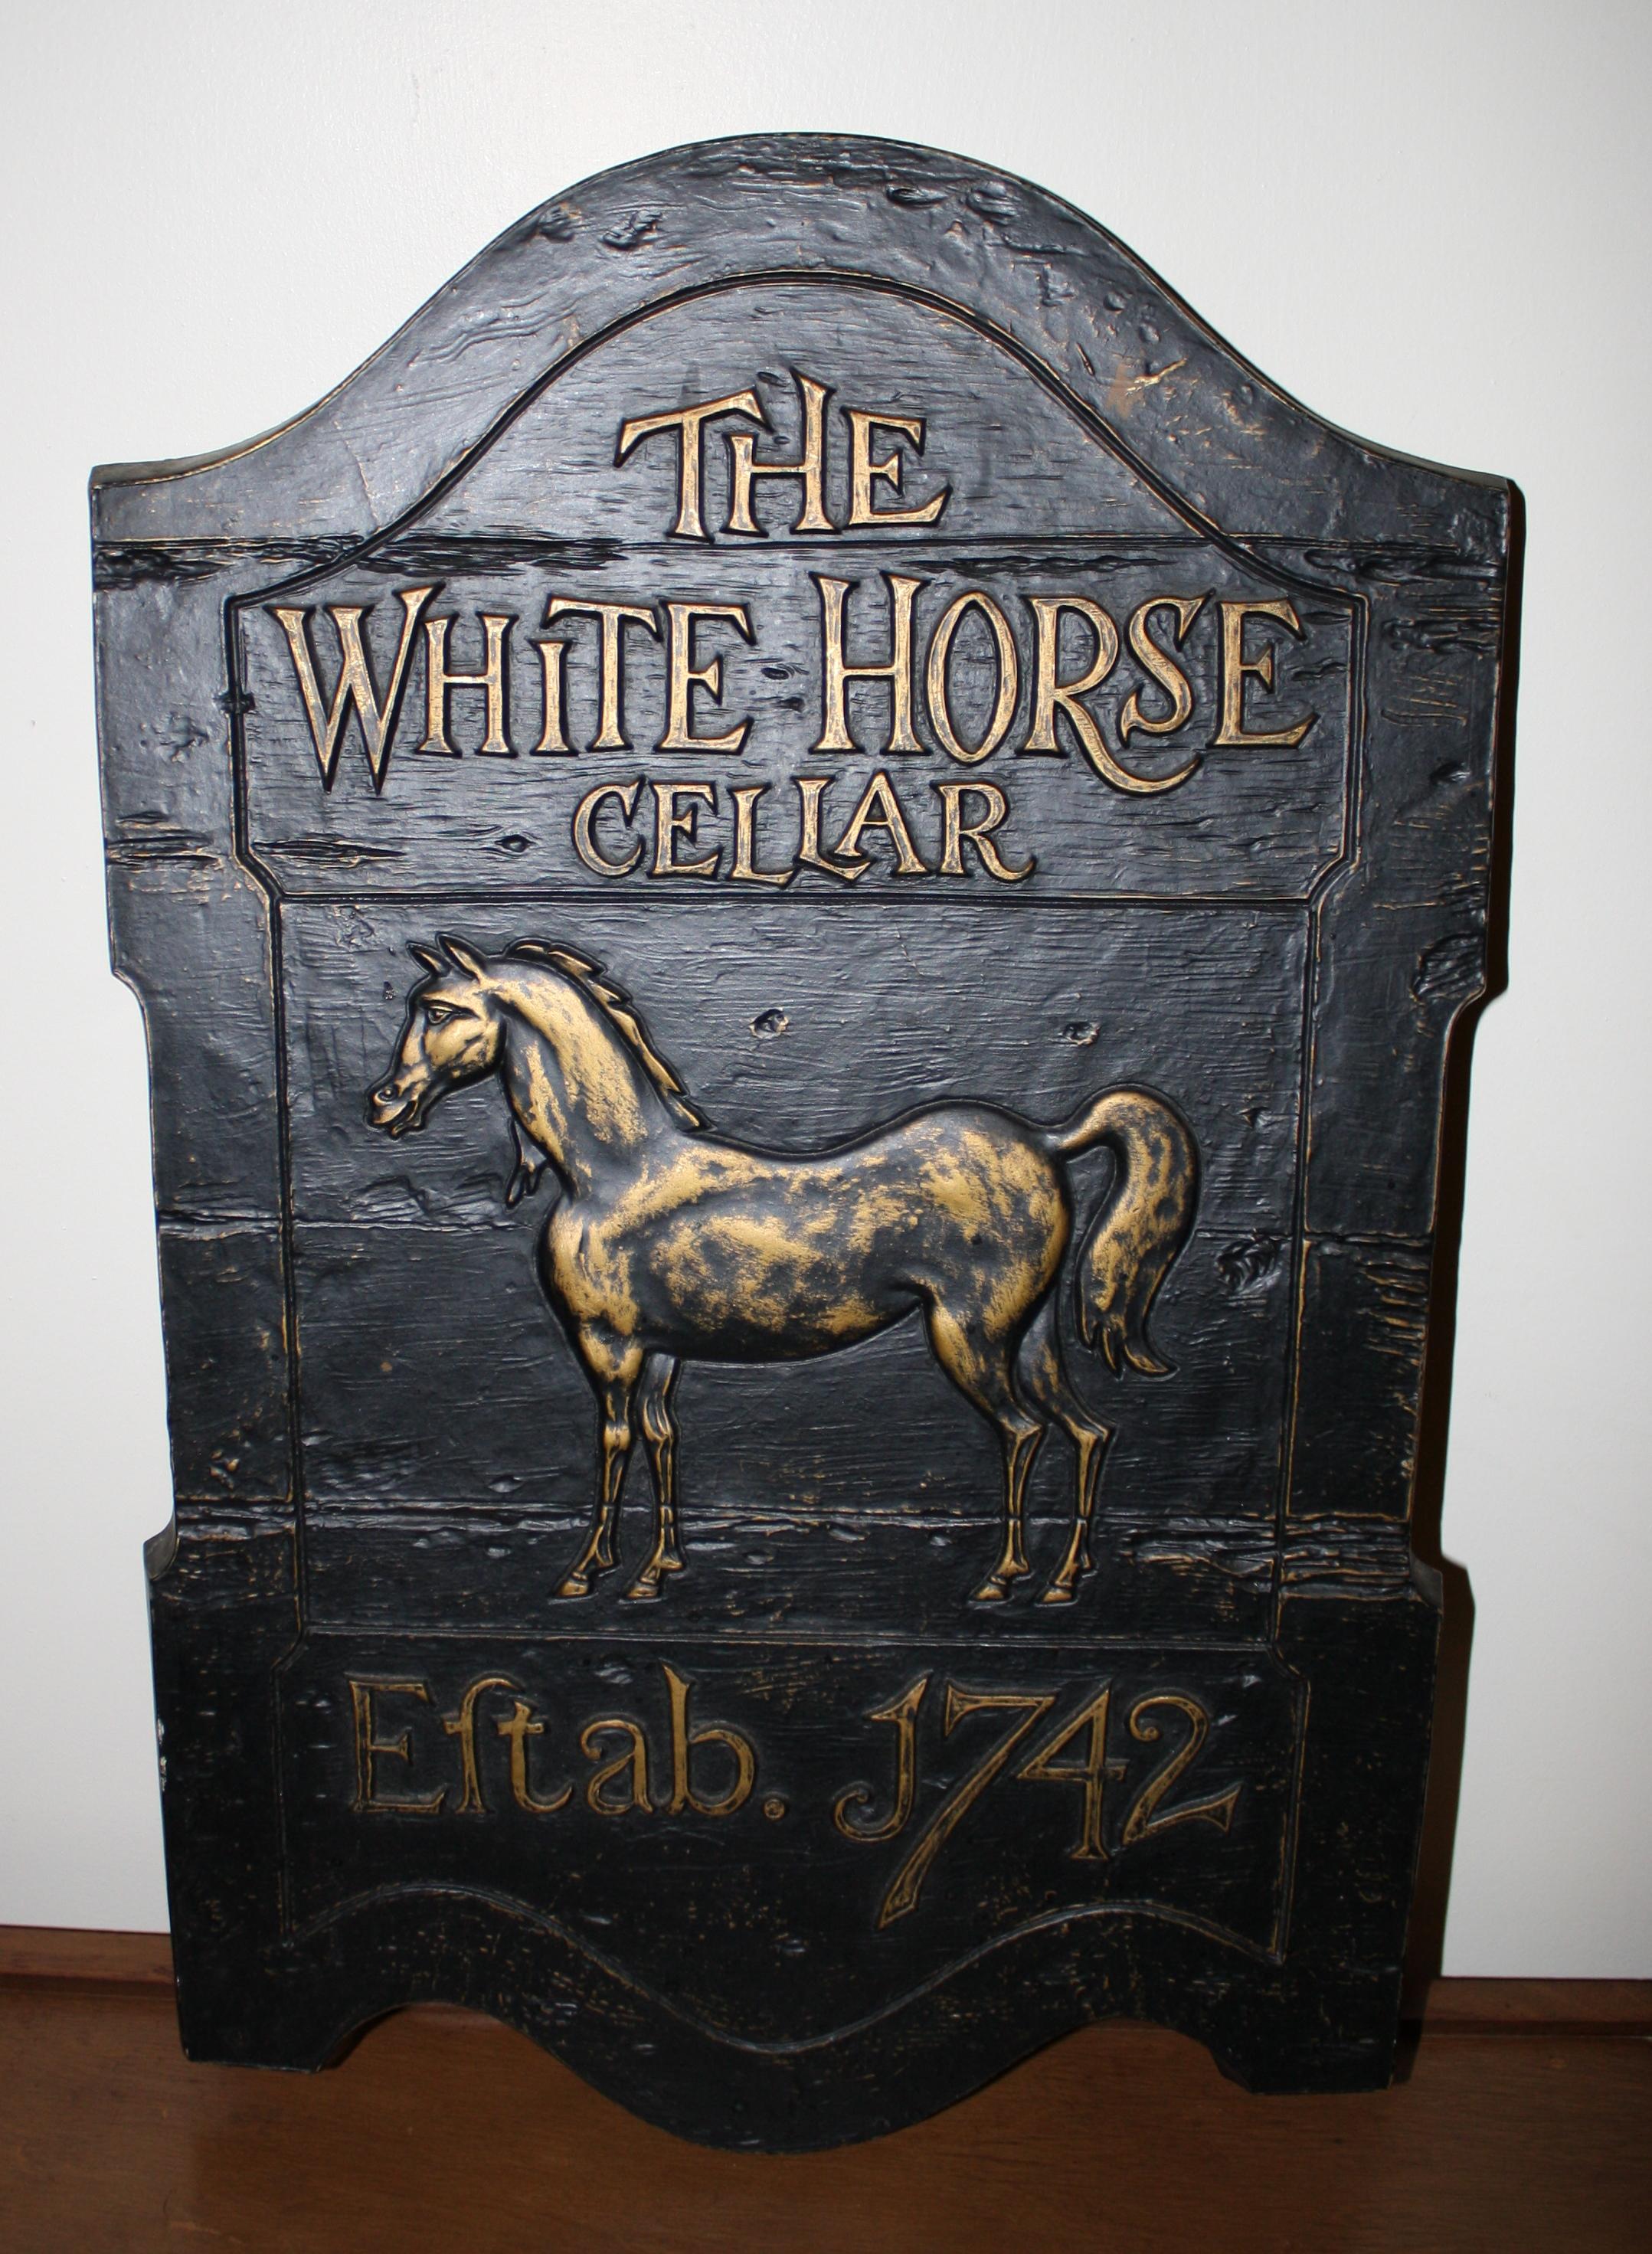 Vintage Scotch Whisky Advertising Sign  Slainte  Picked